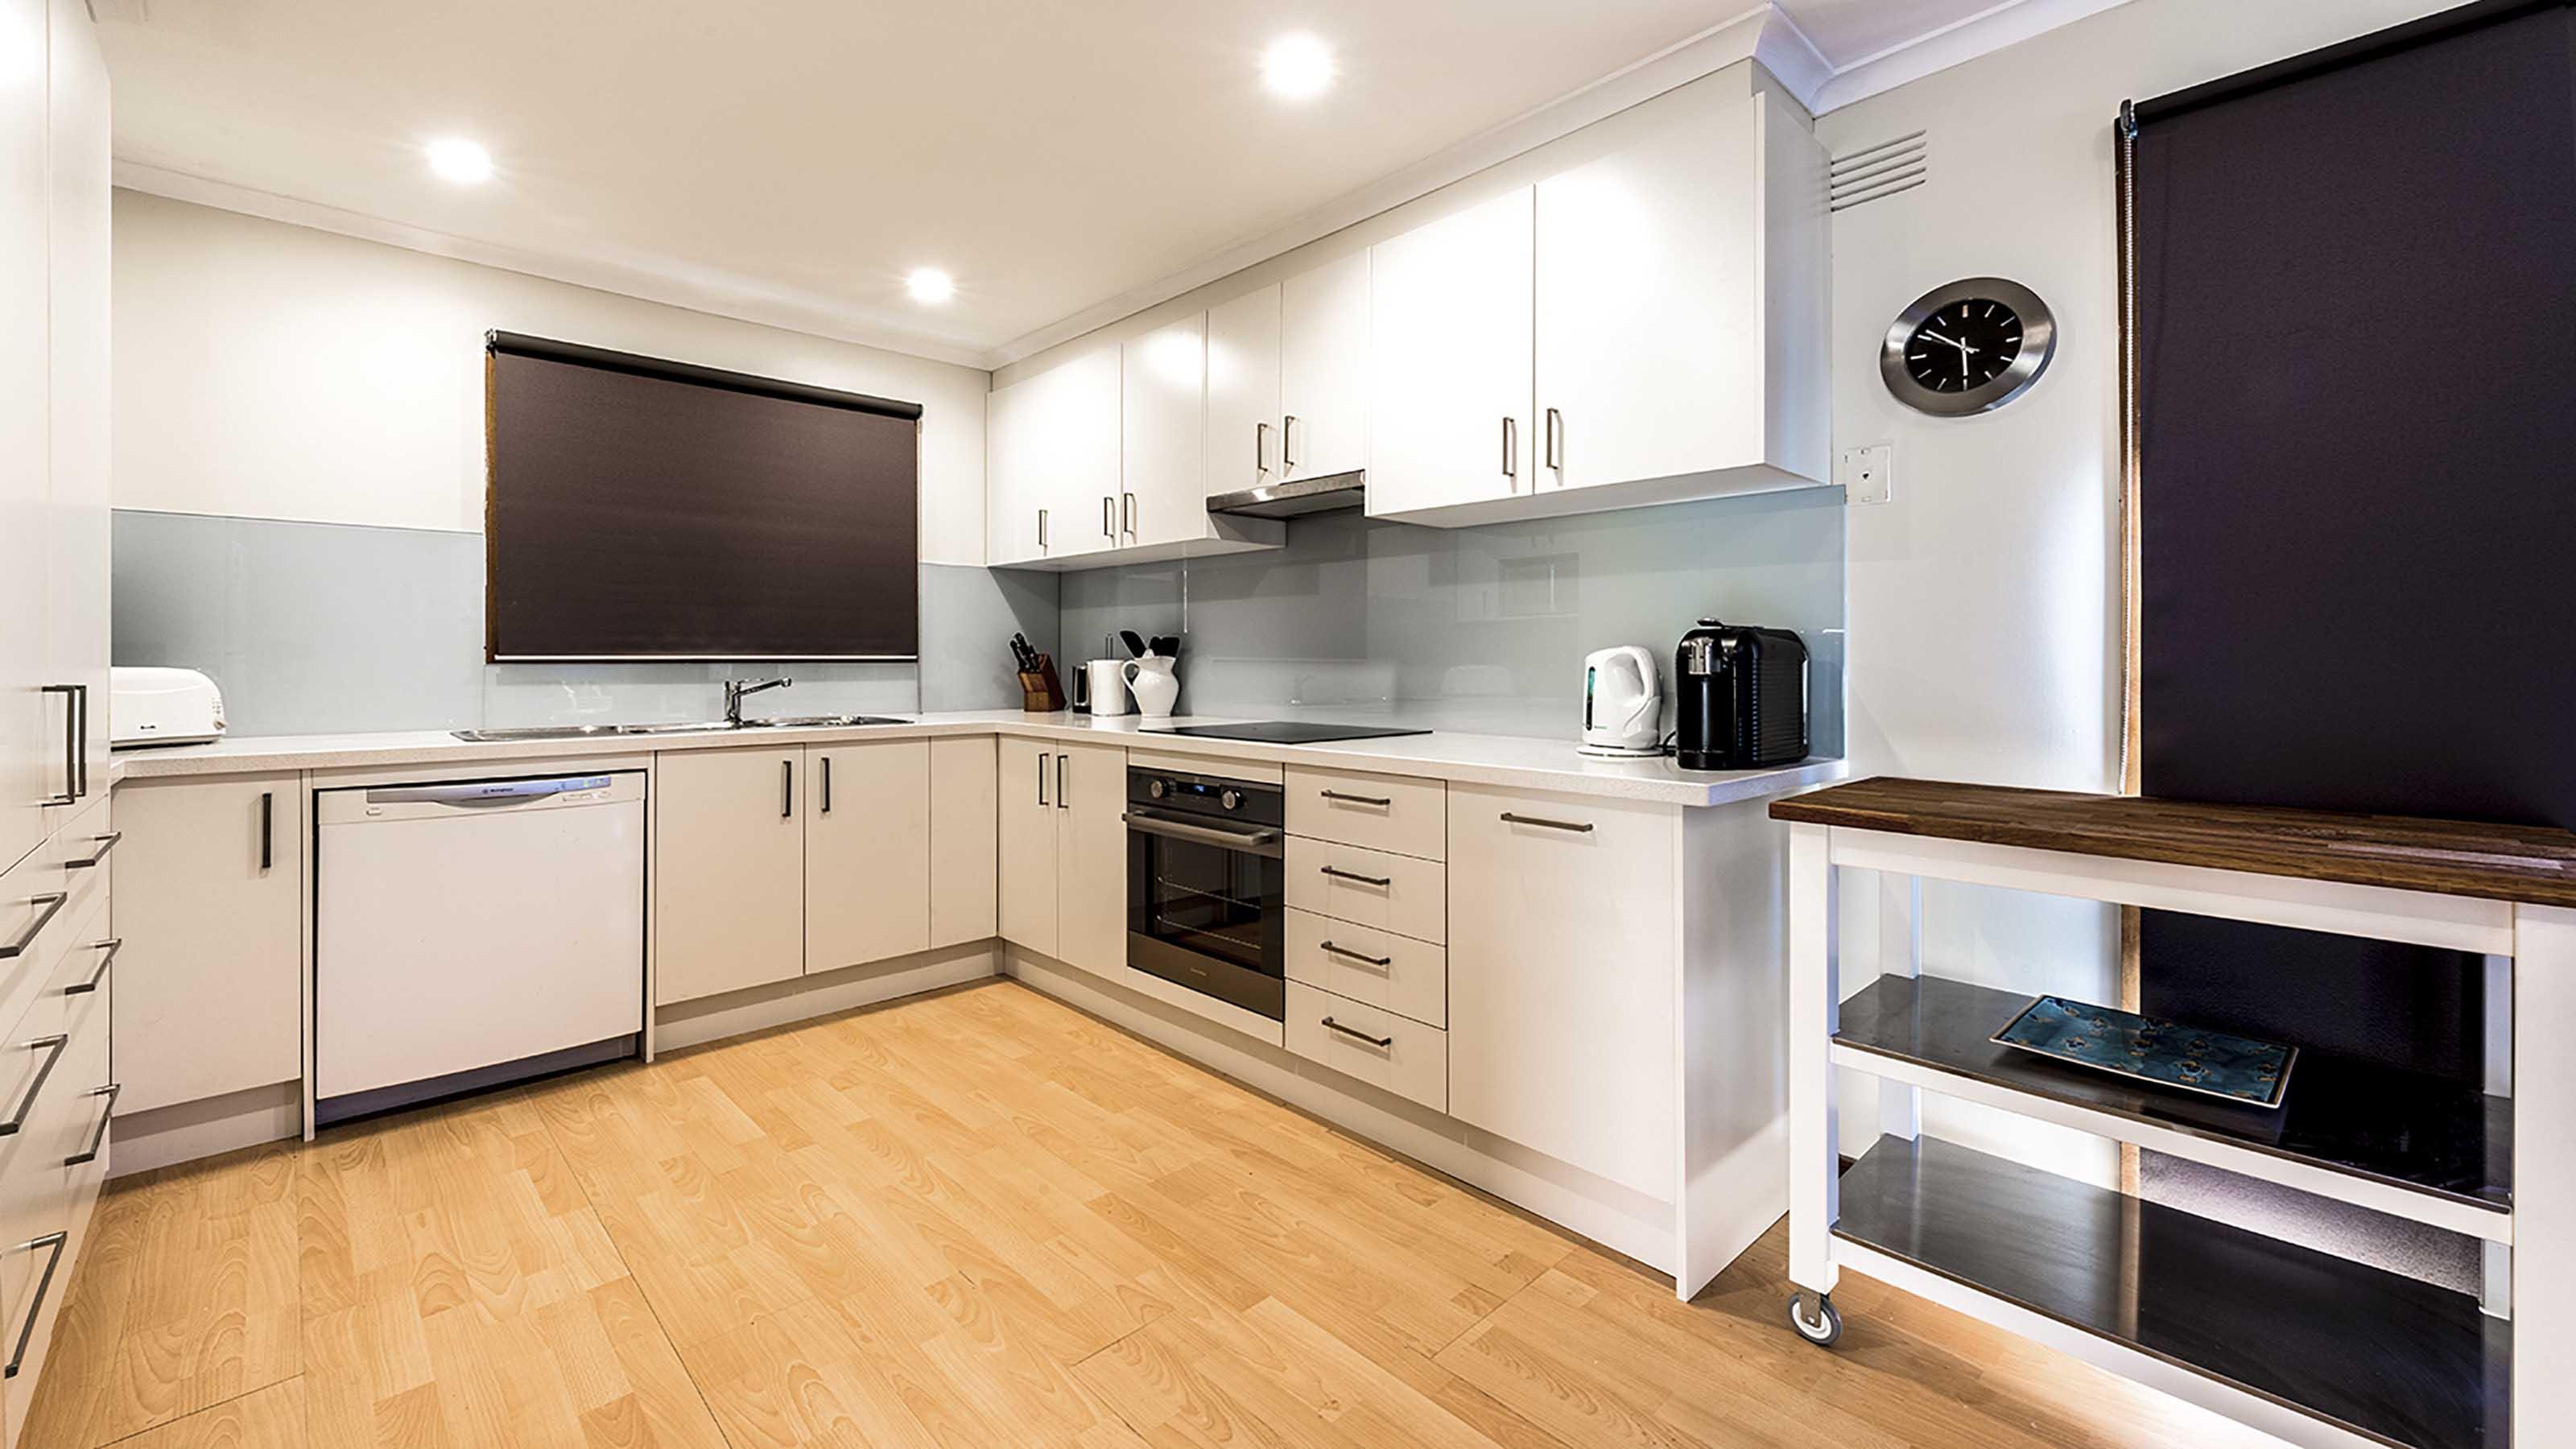 Kolor Kitchen Glass Splashbacks Blue Kitchen Renovation Ideas Torquay Supplied